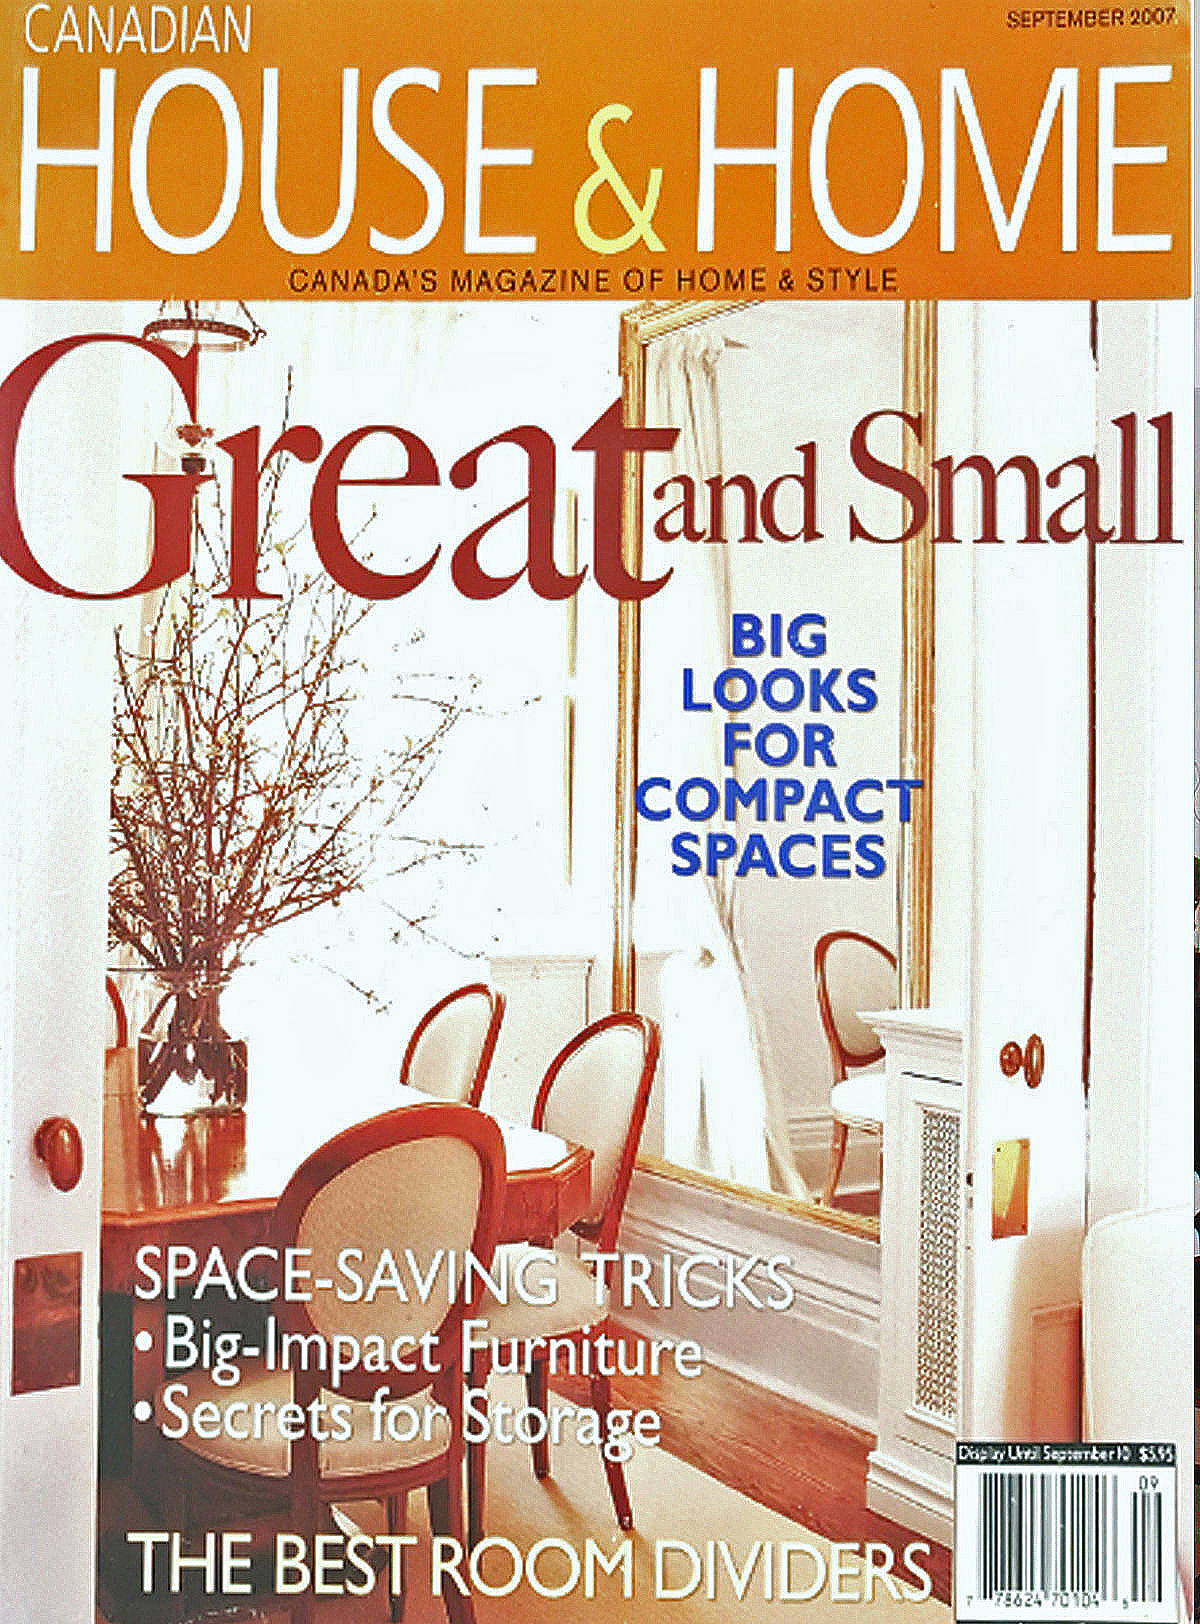 Canadian House & Home - September 2007